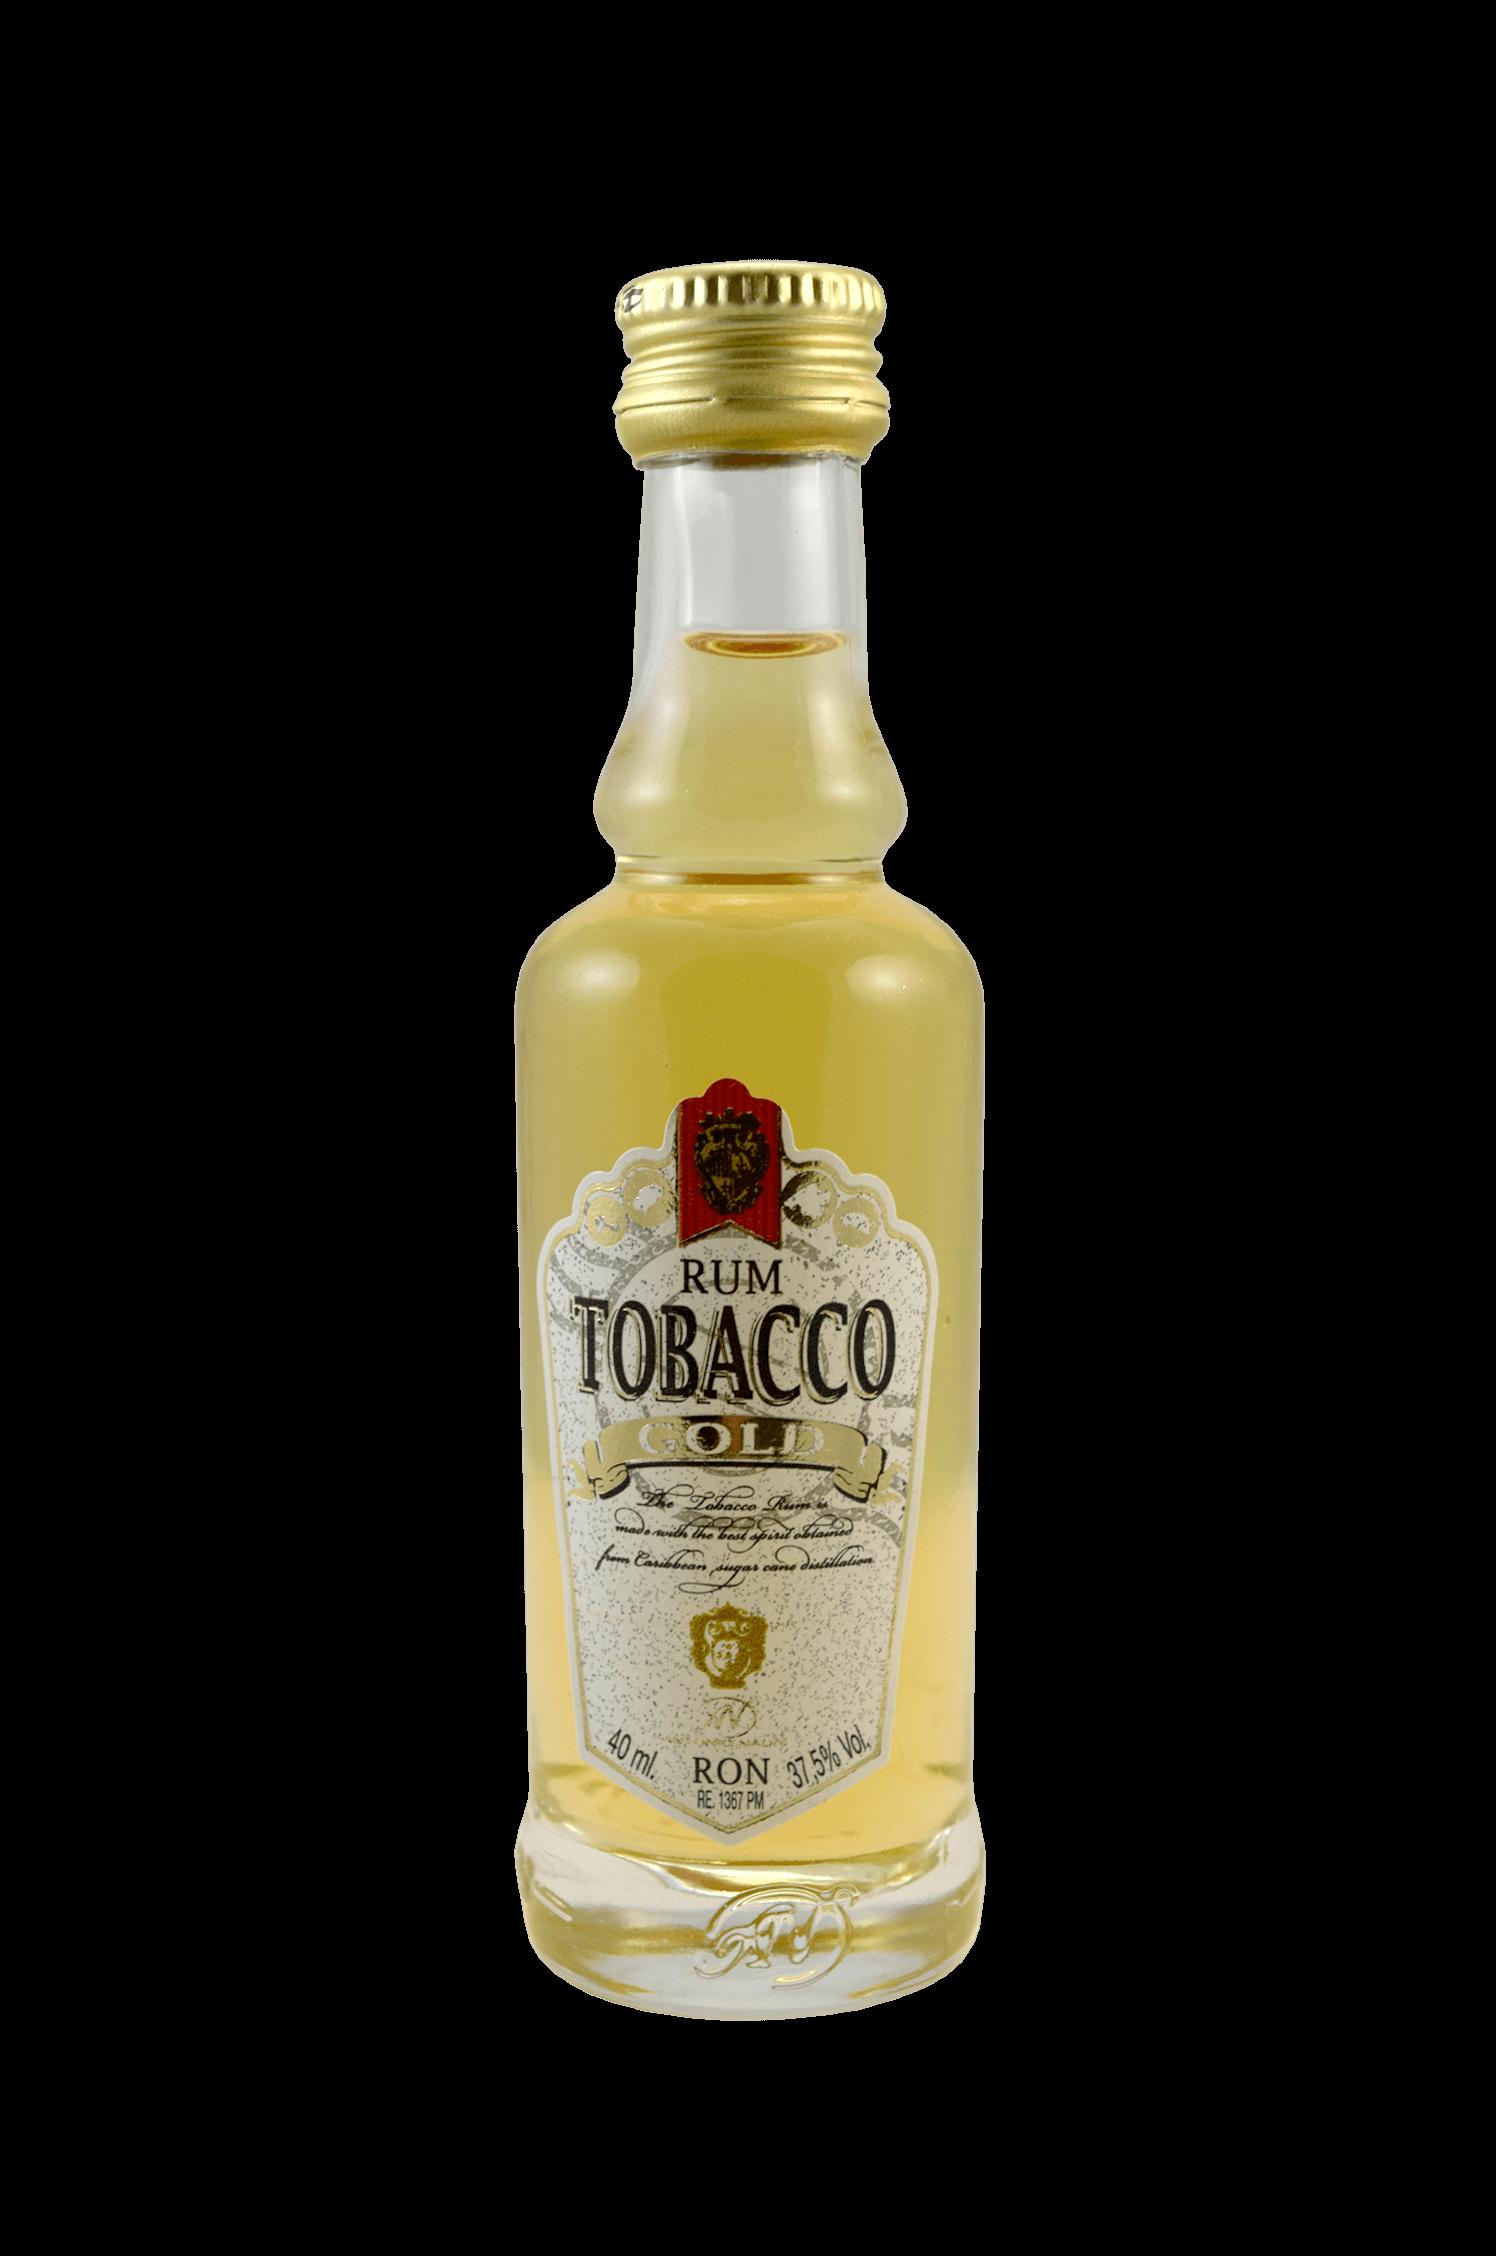 Rum Tobacco Gold